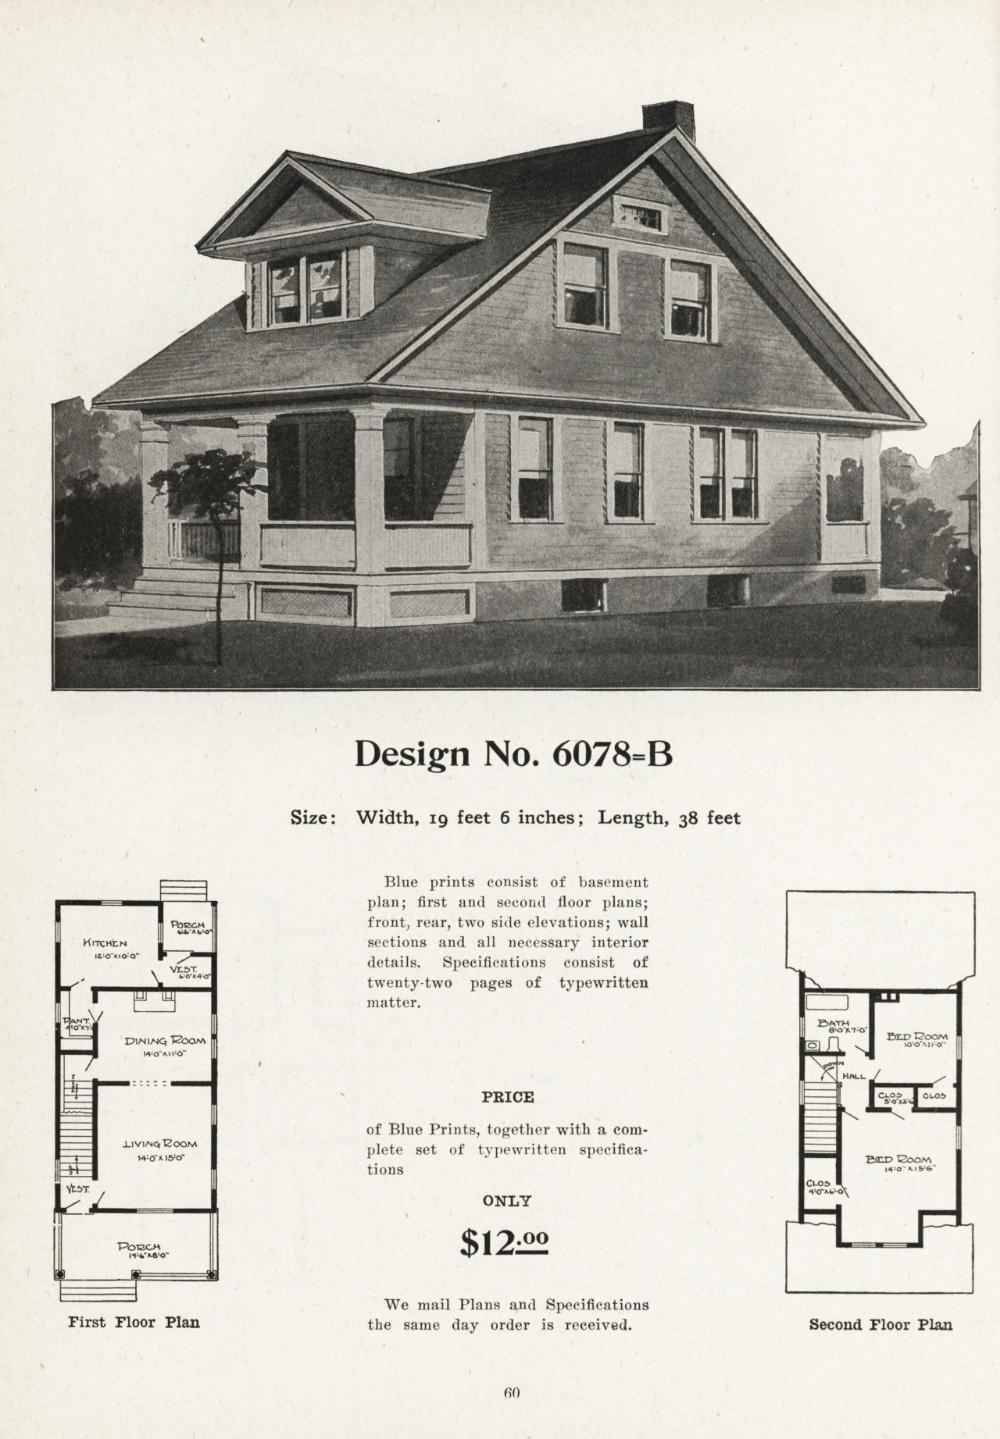 United States 1908 Design No 6078 B A Vintage Home Plans In 2020 Vintage House House Plans Cottages And Bungalows